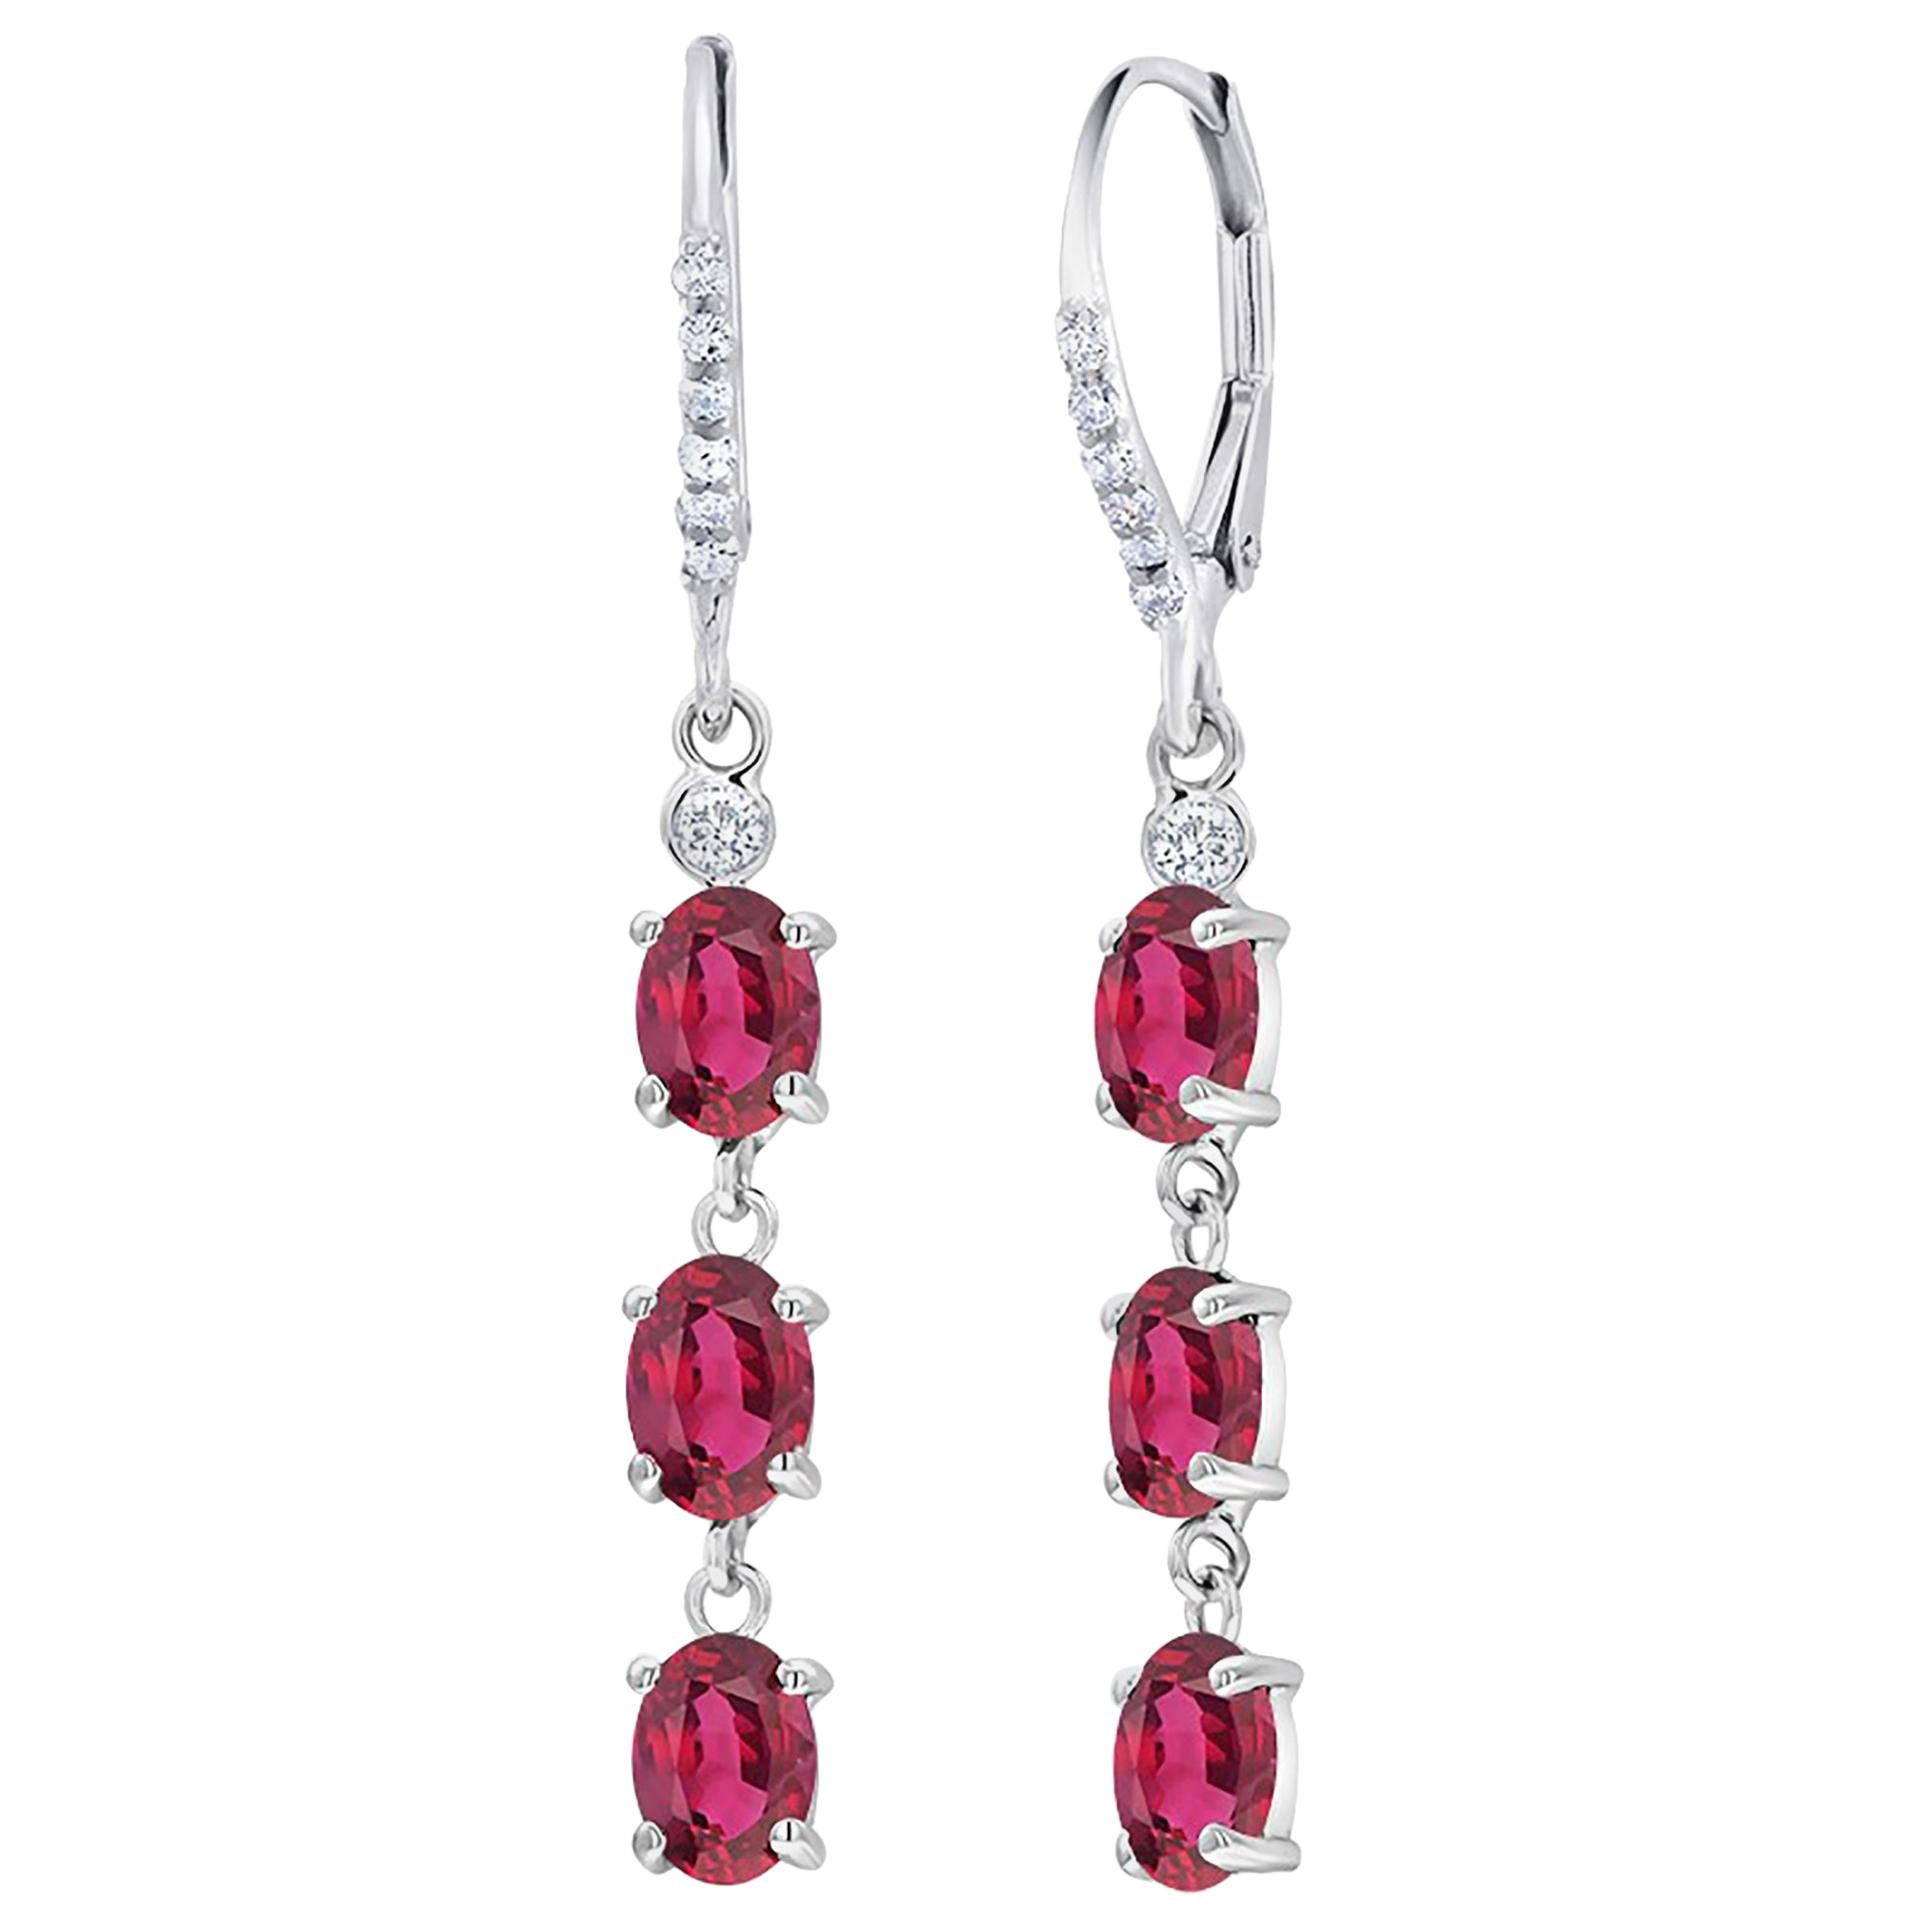 Diamond Gold Hoop Earrings with Six Burma Rubies Weighing 4.50 Carat